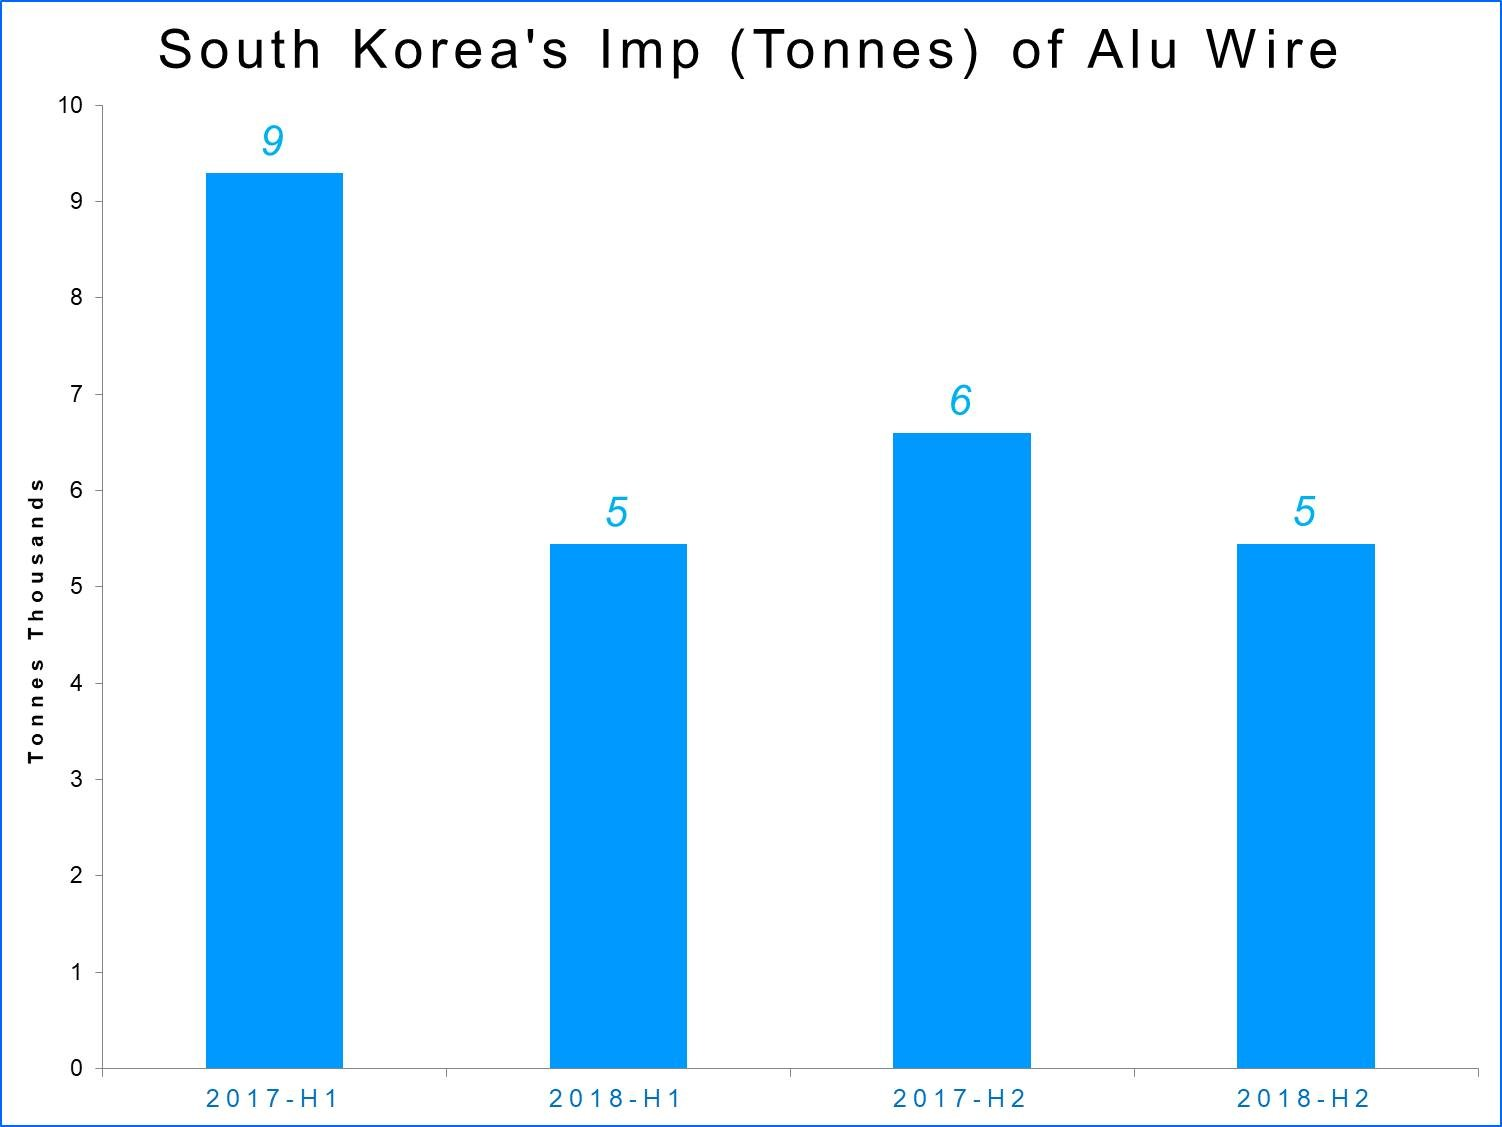 South Korea's import of aluminium wire estimated to decline